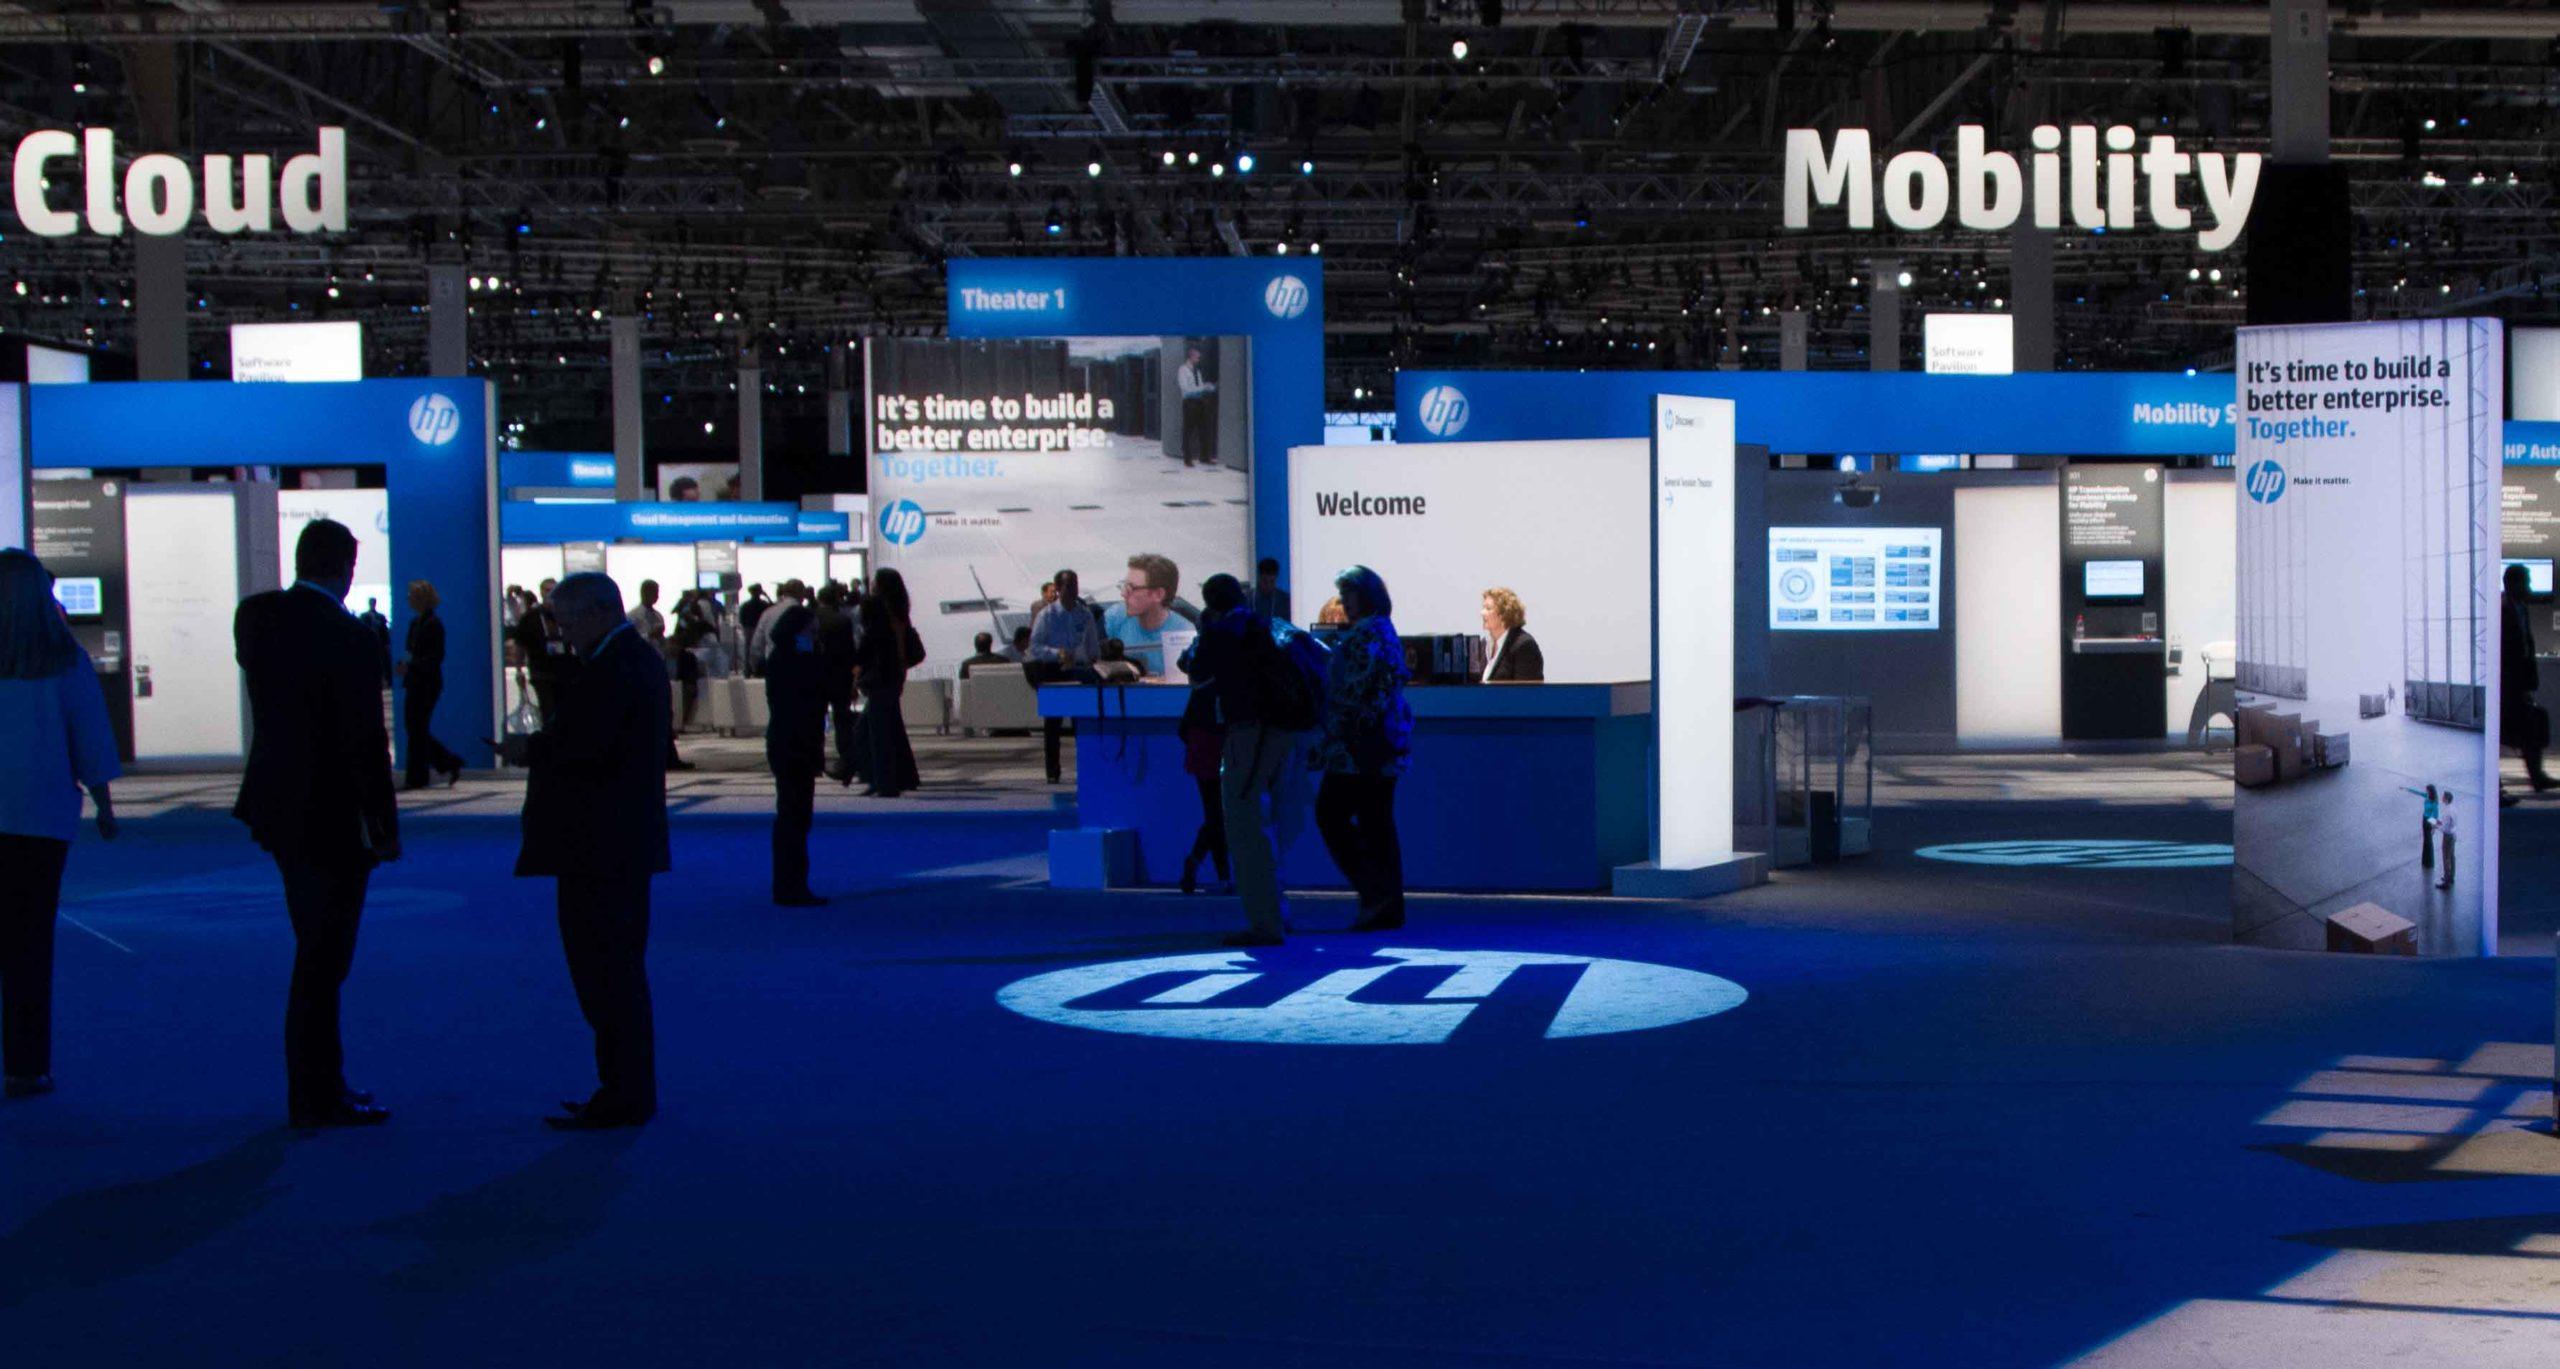 CT Consulting – участник конференции Cloud & Mobility 2014